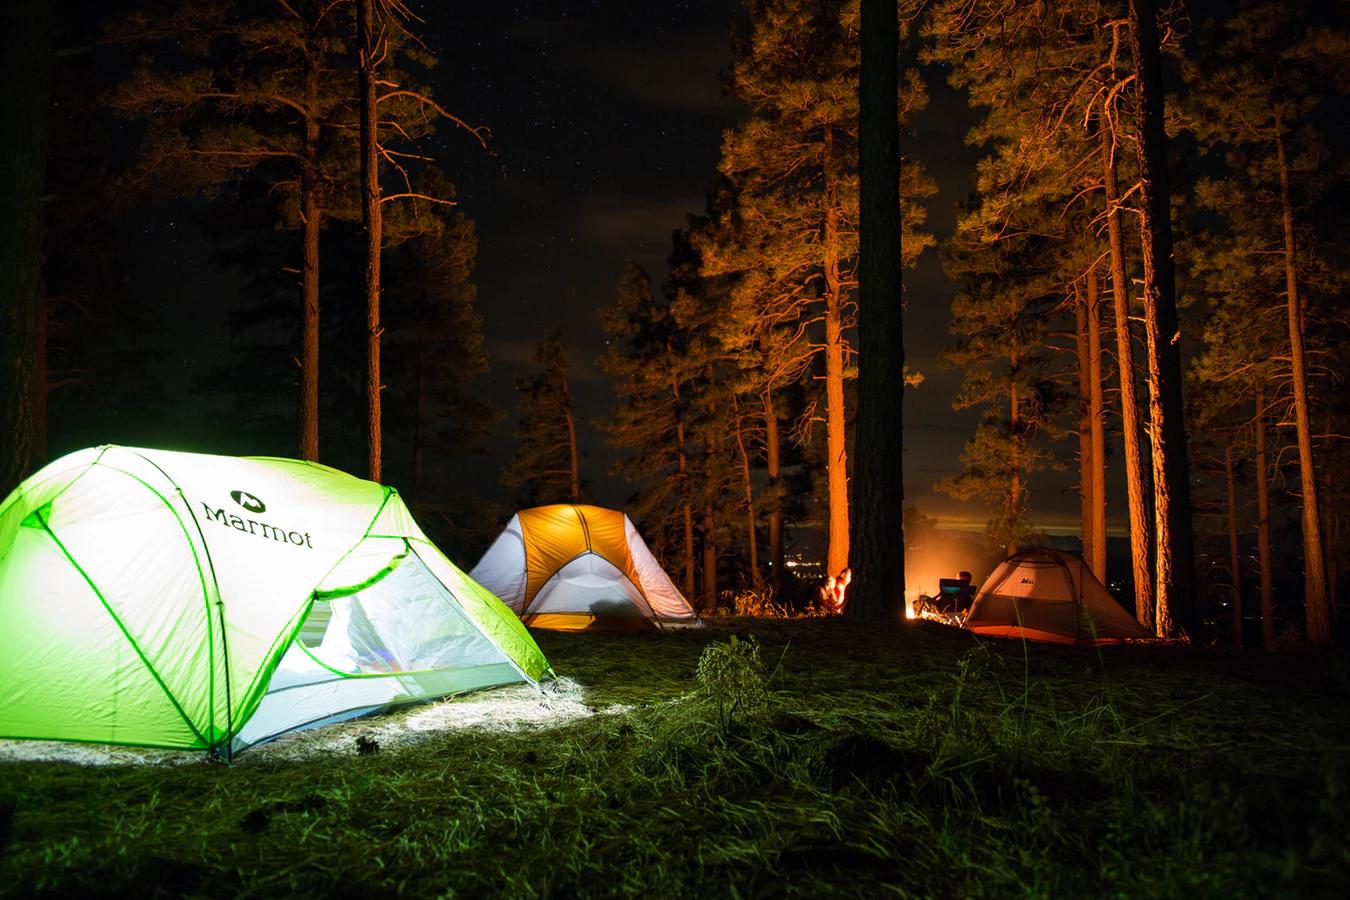 festival camping tips 2018